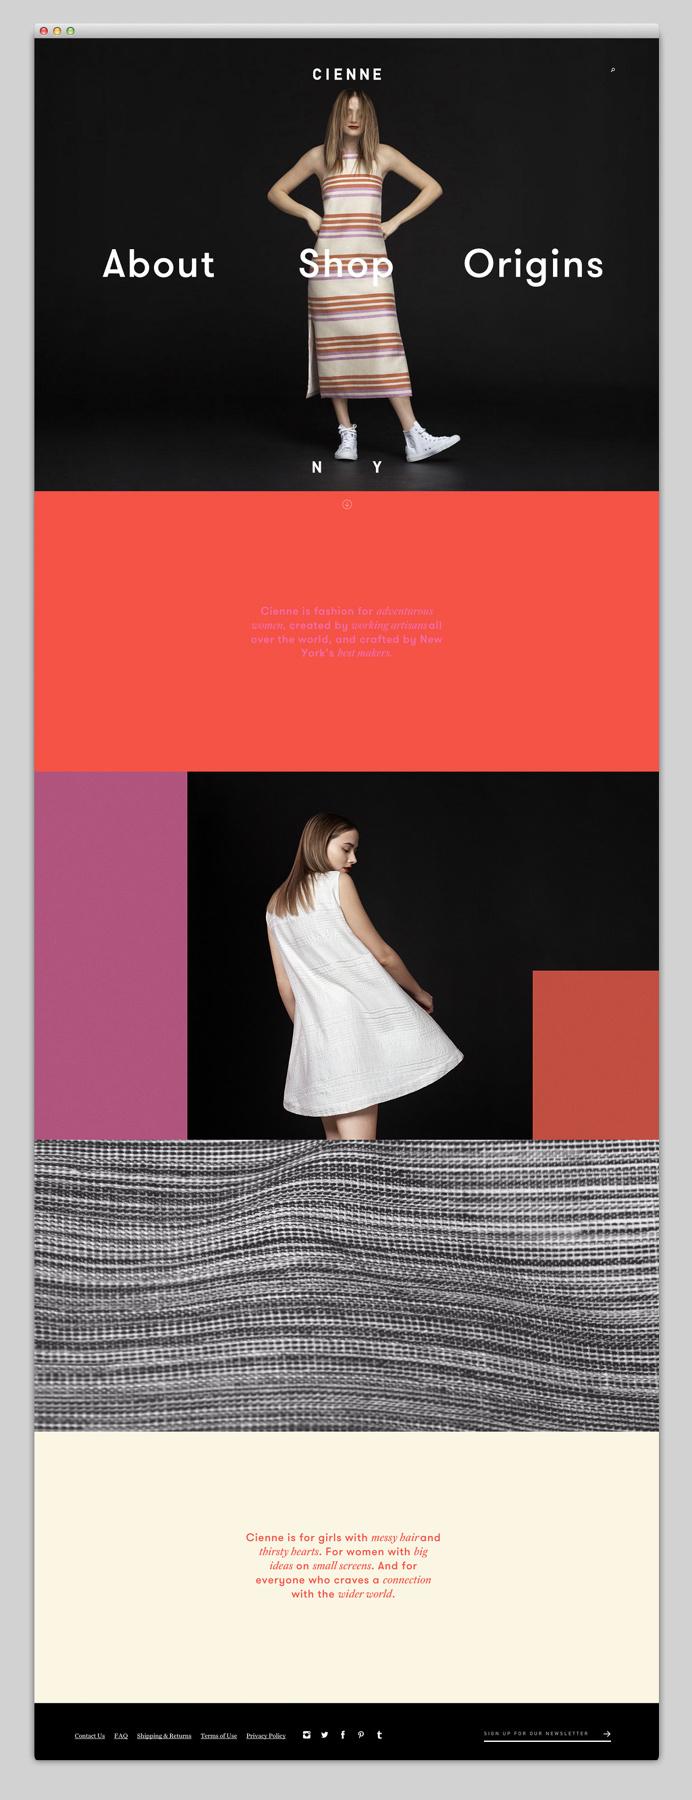 www.mindsparklemag.com –A showcase of effective and beautiful web design. #webdesign #website #design #minimal #agency #portfolio #beaut